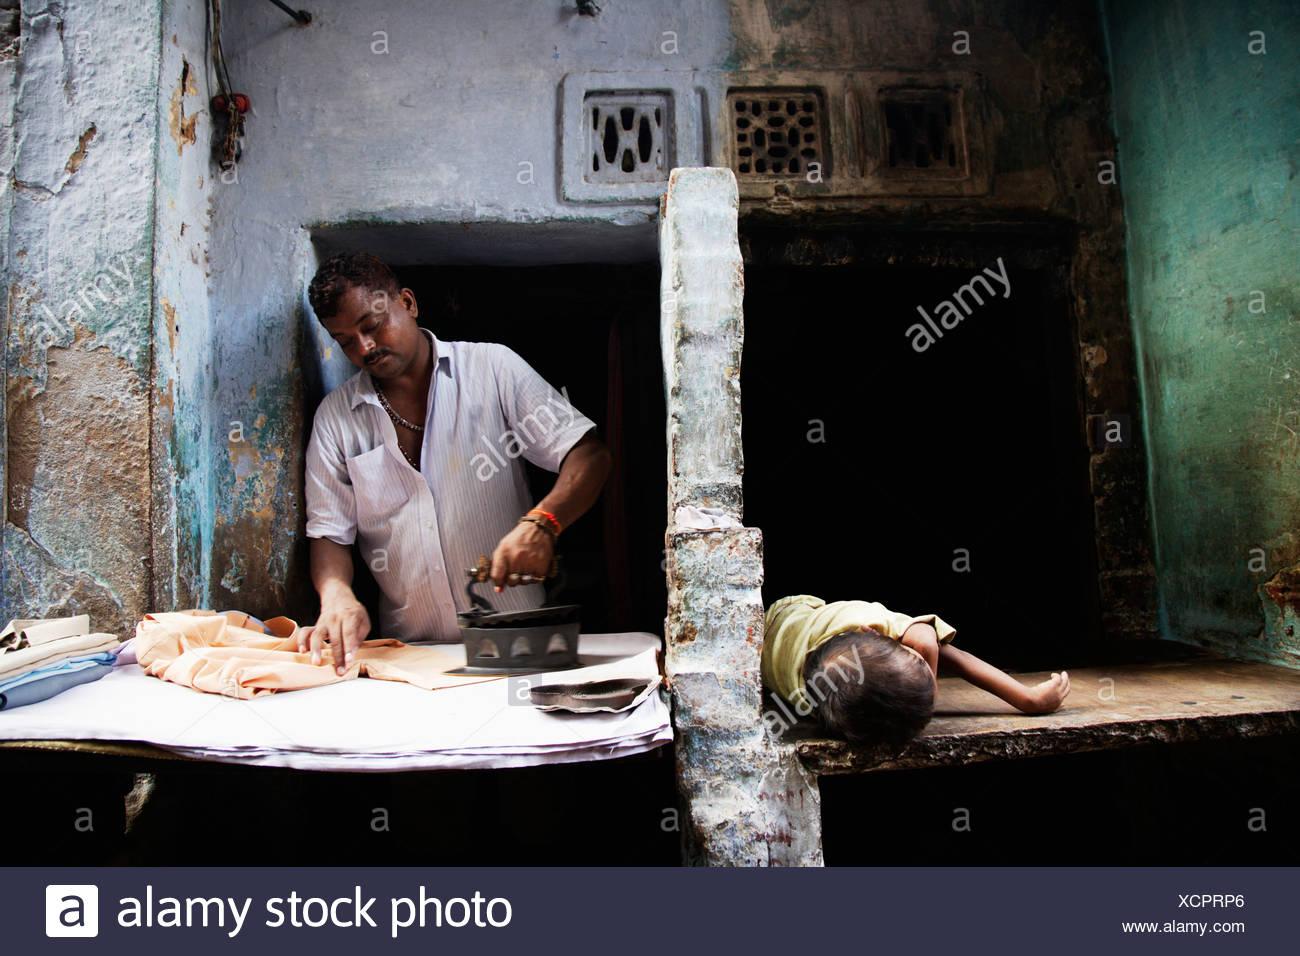 Man ironing clothes while his child naps, Varanasi, India - Stock Image